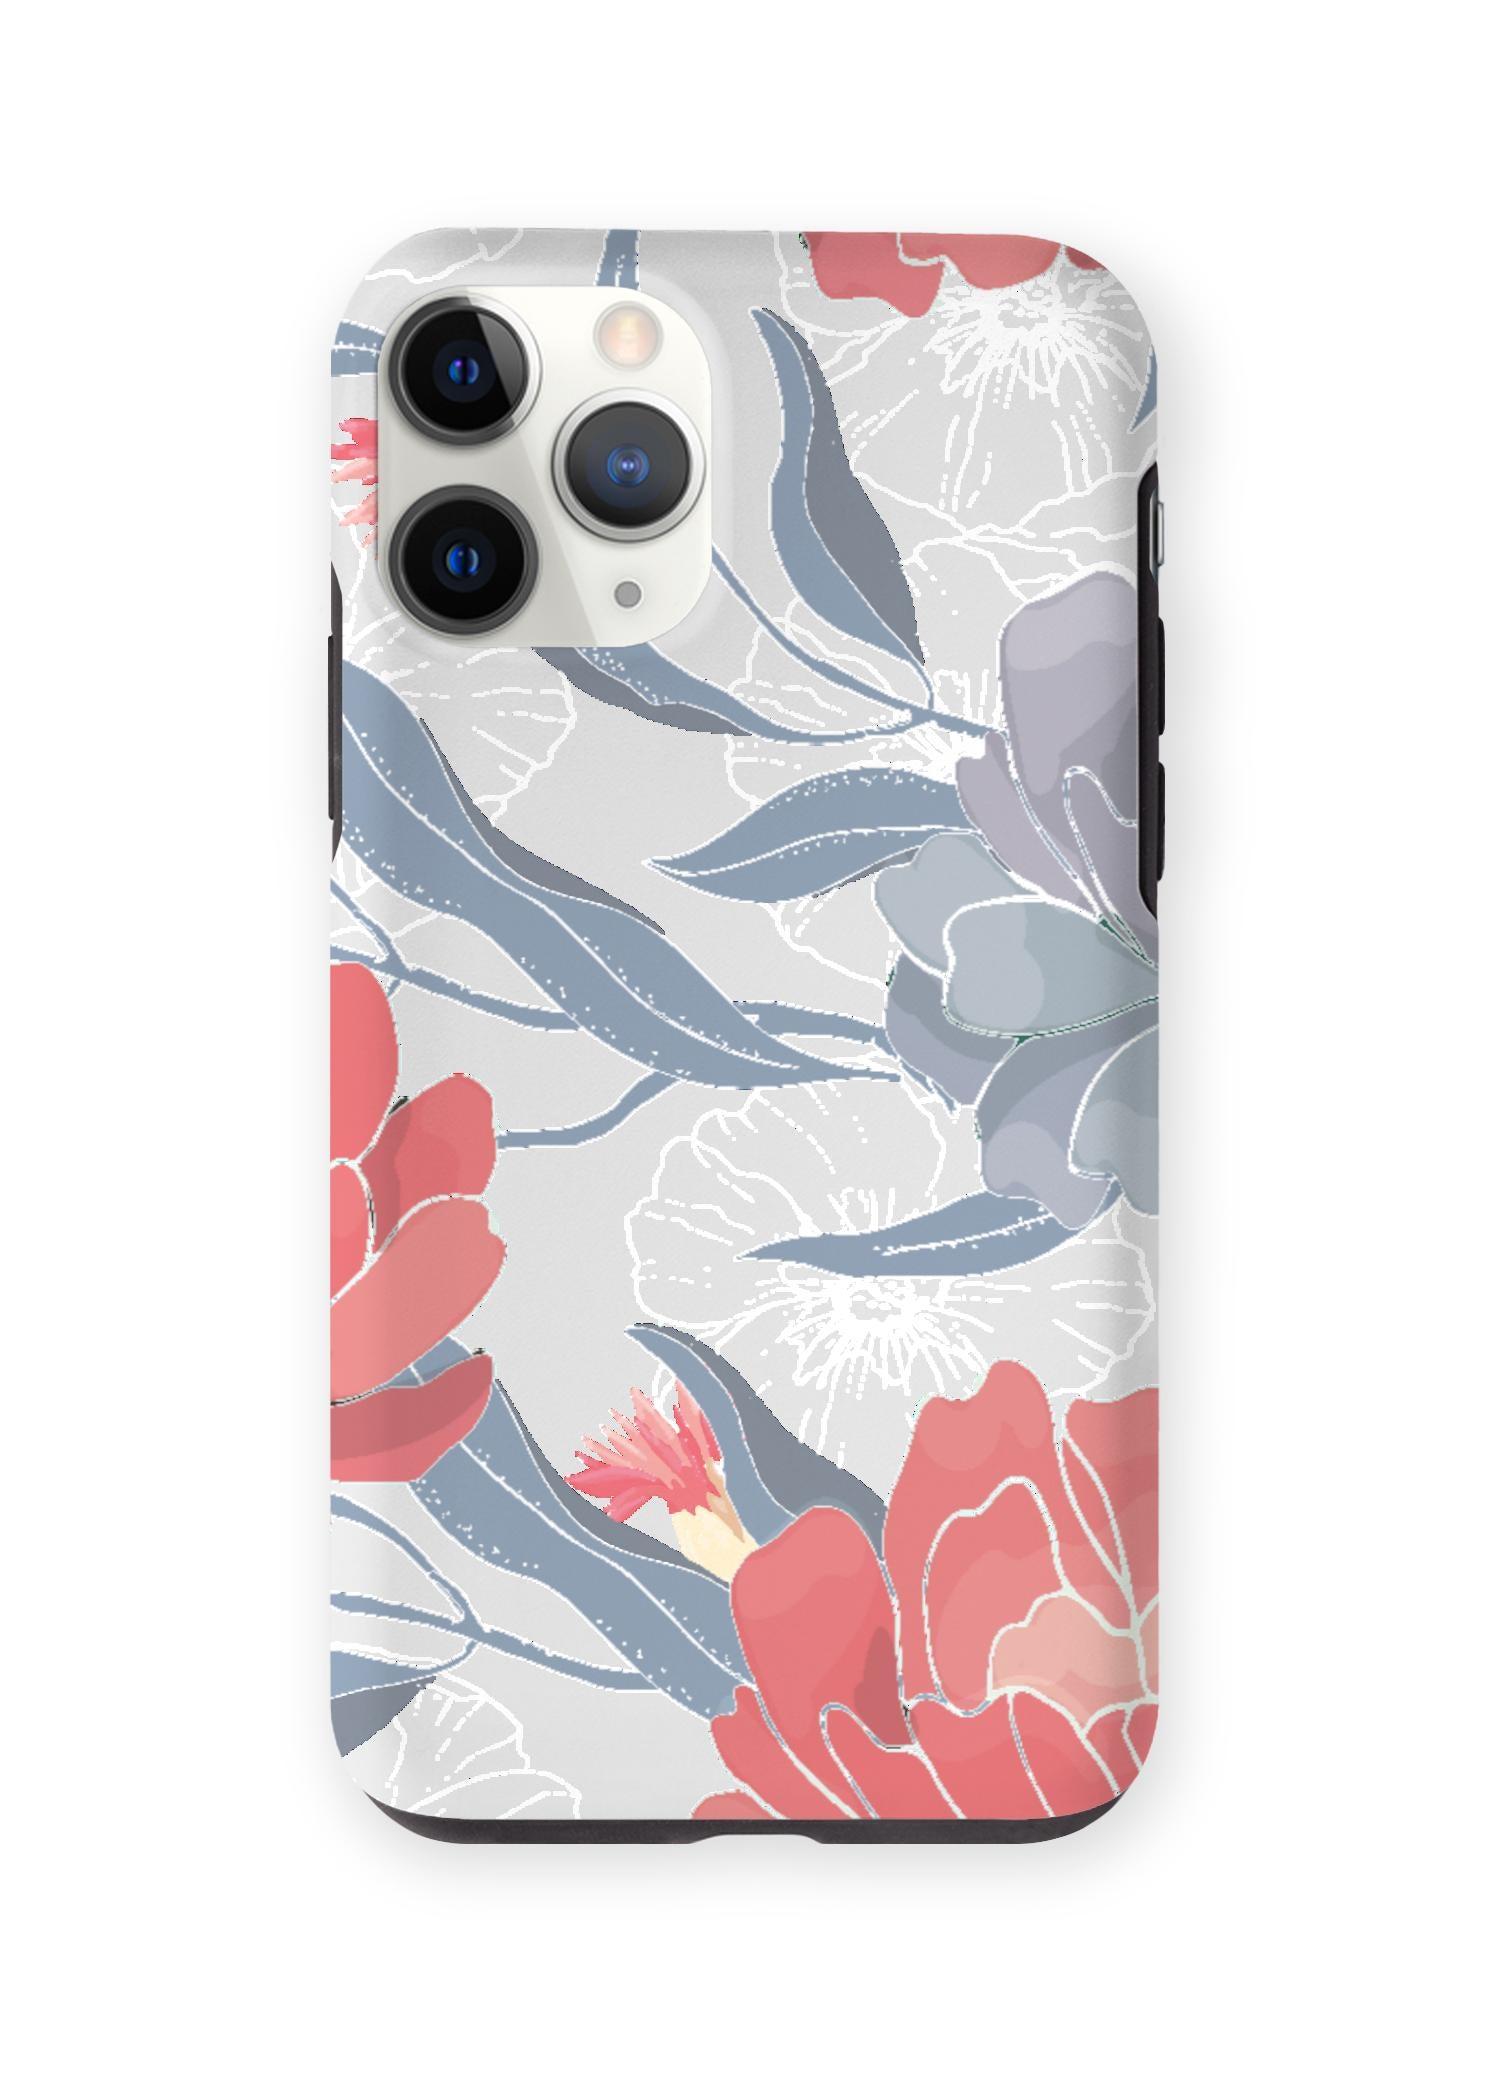 VIDA iPhone Case - Blue Red Silver Garden by VIDA Original Artist  - Size: iPhone 11 Pro / Tough